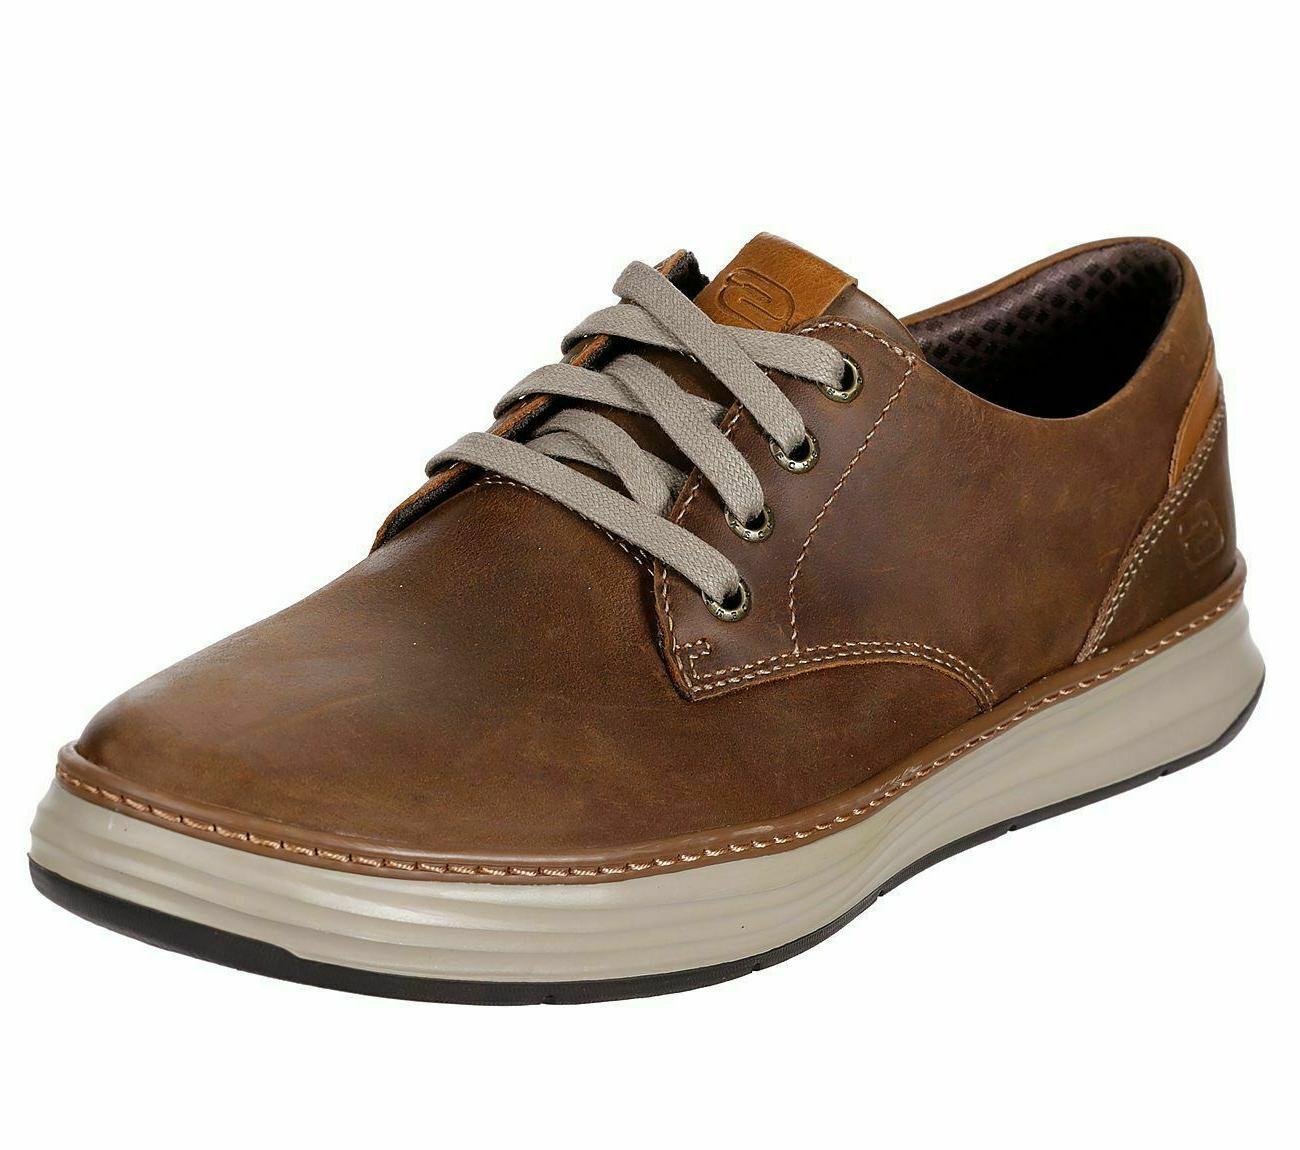 Skechers Brown Leather Men Memory Casual Oxford